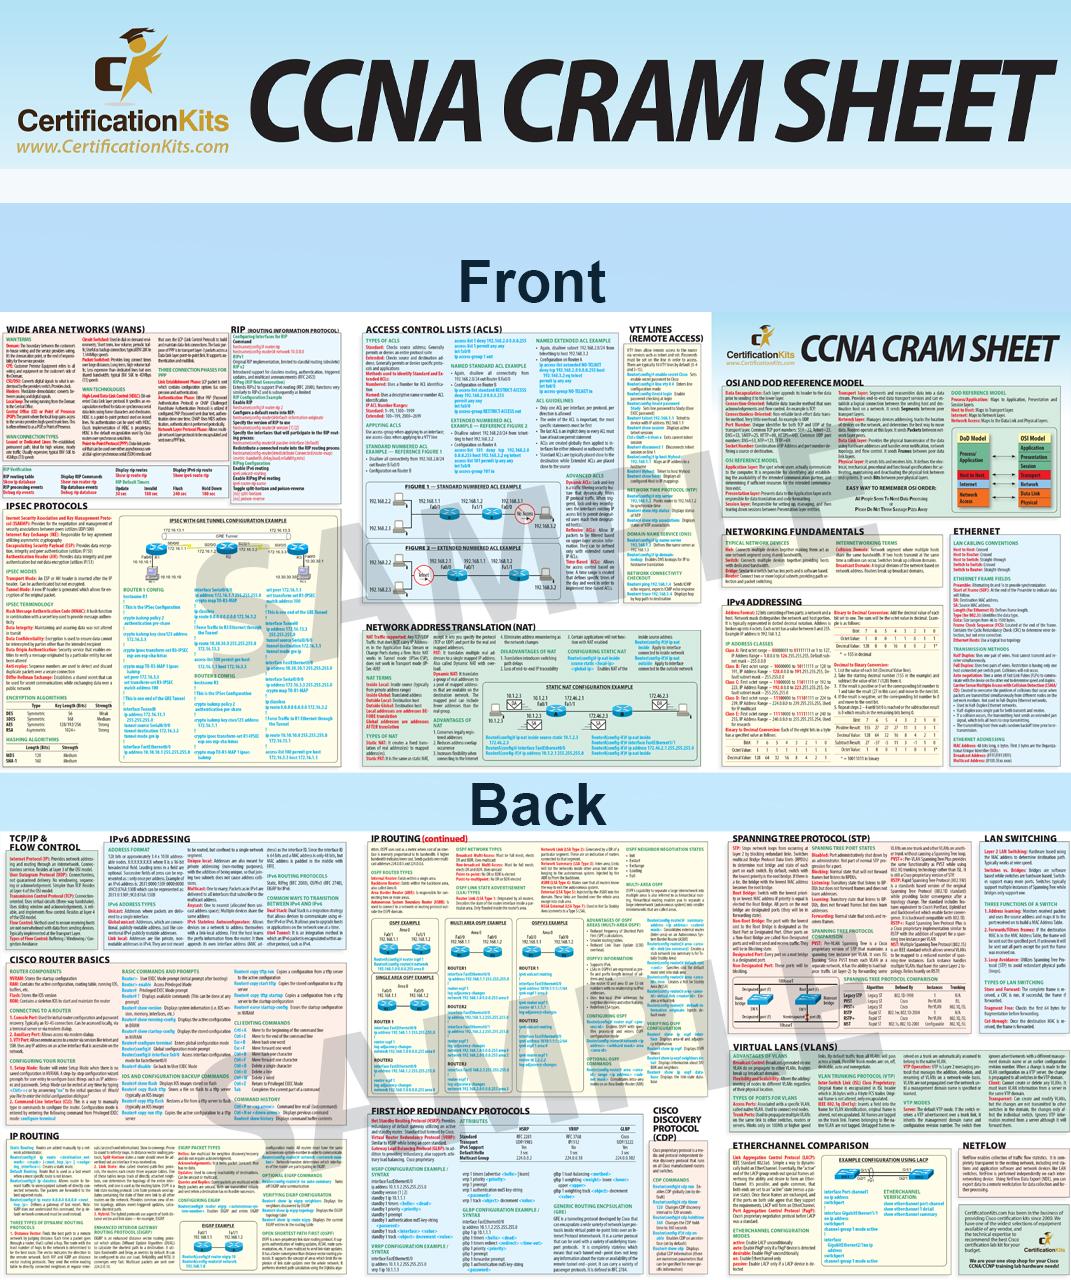 cram-v3-3.jpg